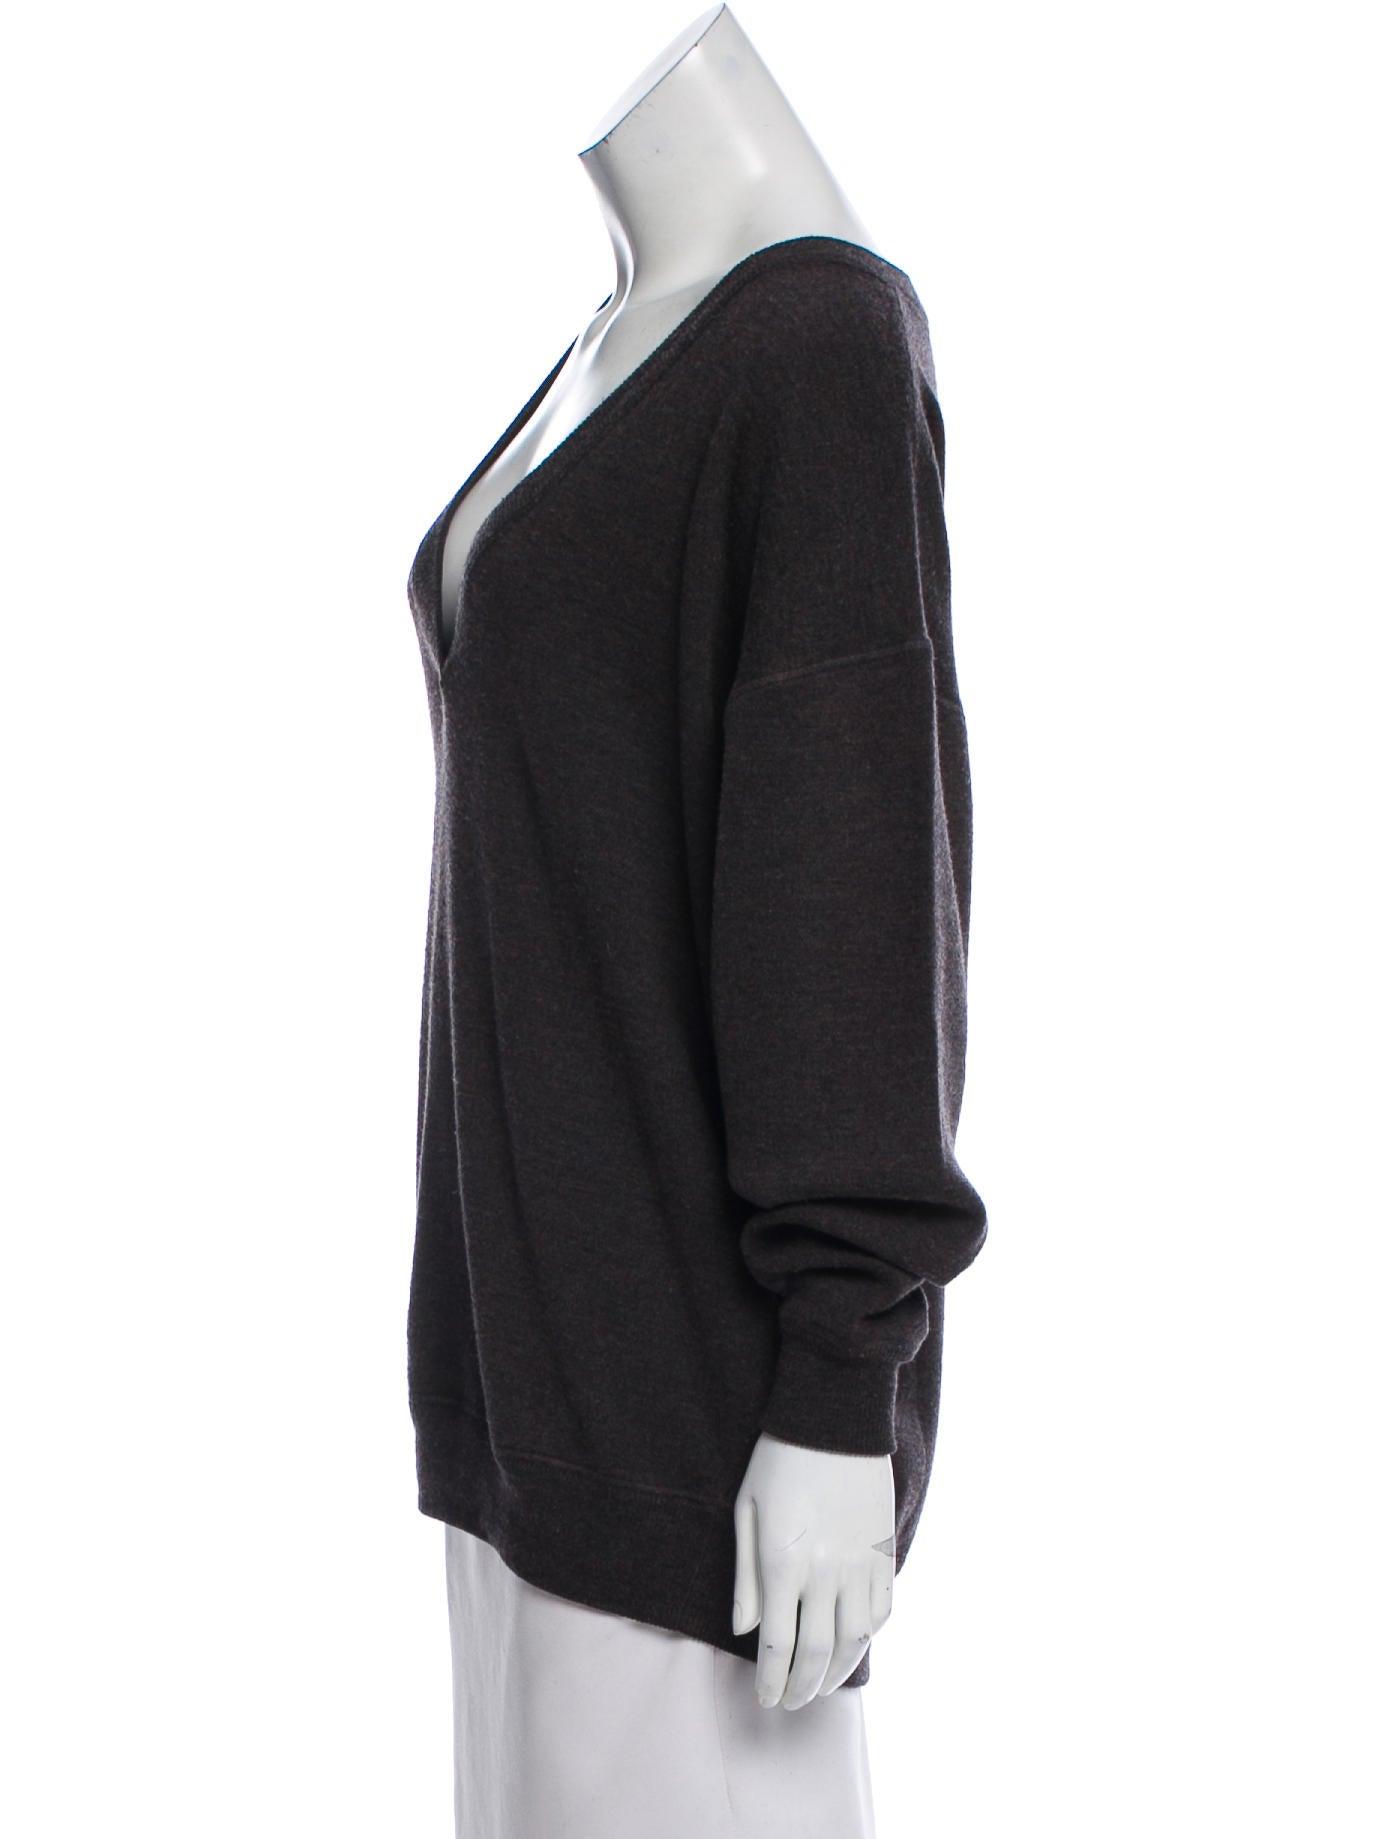 Jason Wu Oversize Wool Sweater - Clothing - JAS24582 | The RealReal